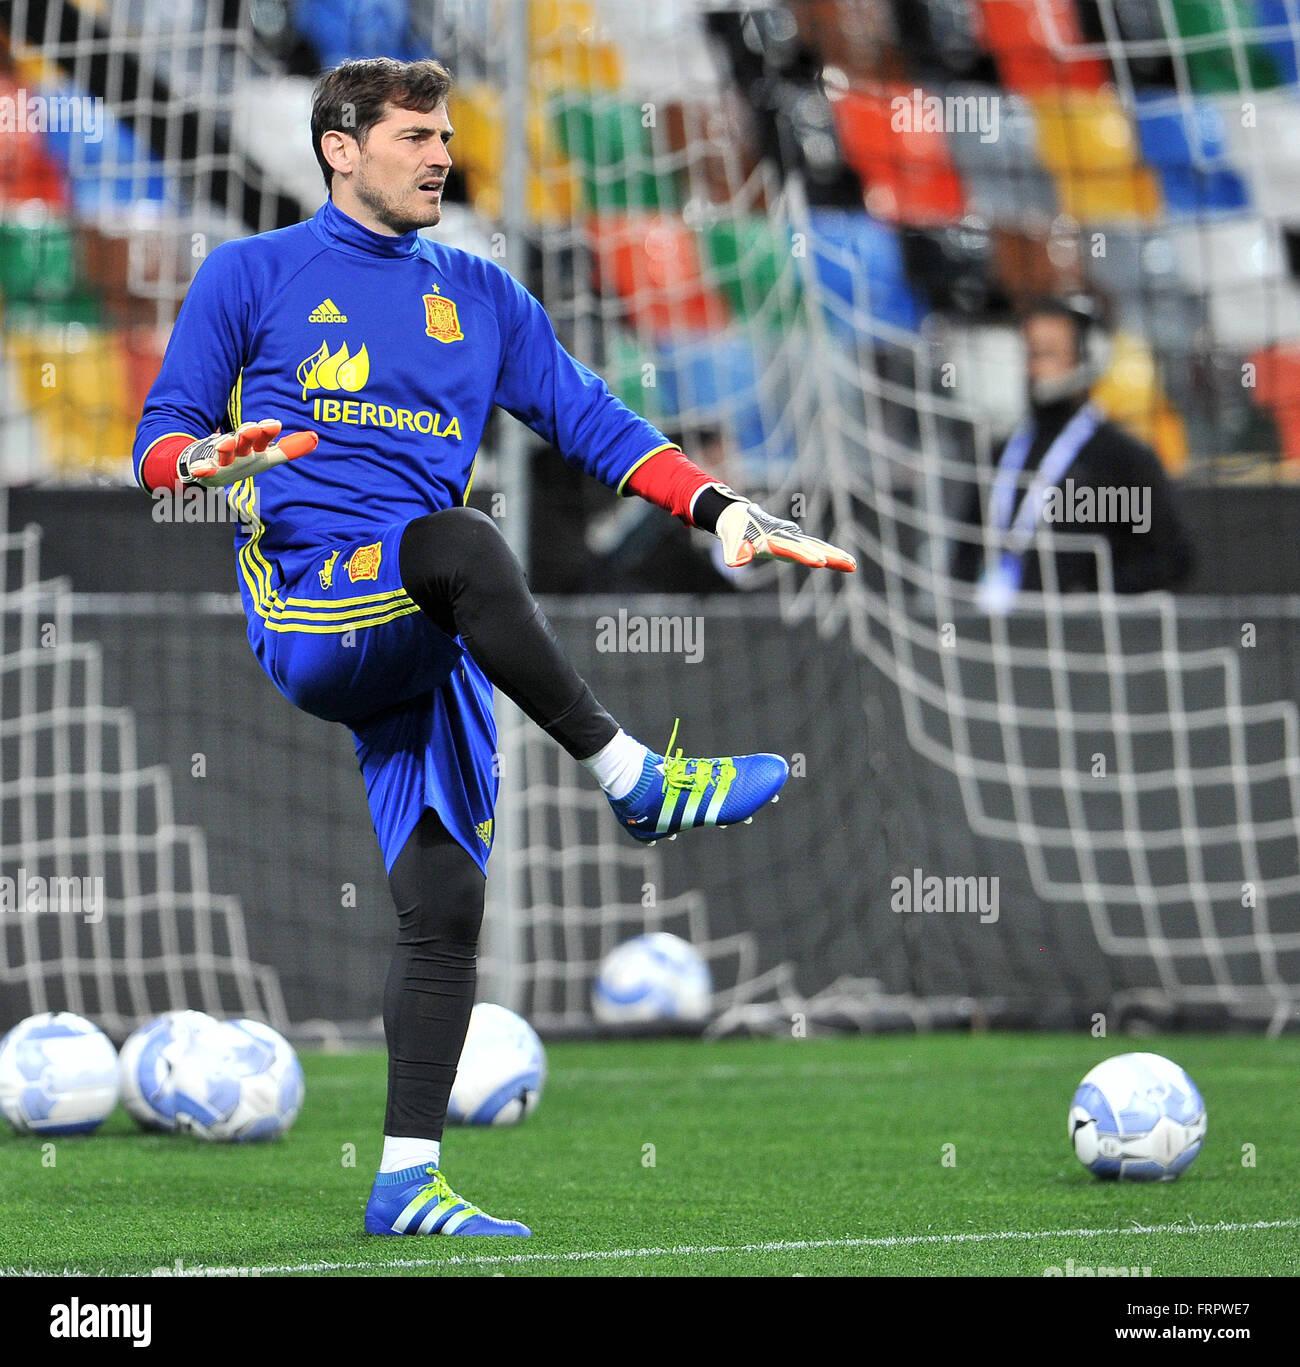 3df59a4cd4a Spain Iker Casillas Football Stock Photos   Spain Iker Casillas ...